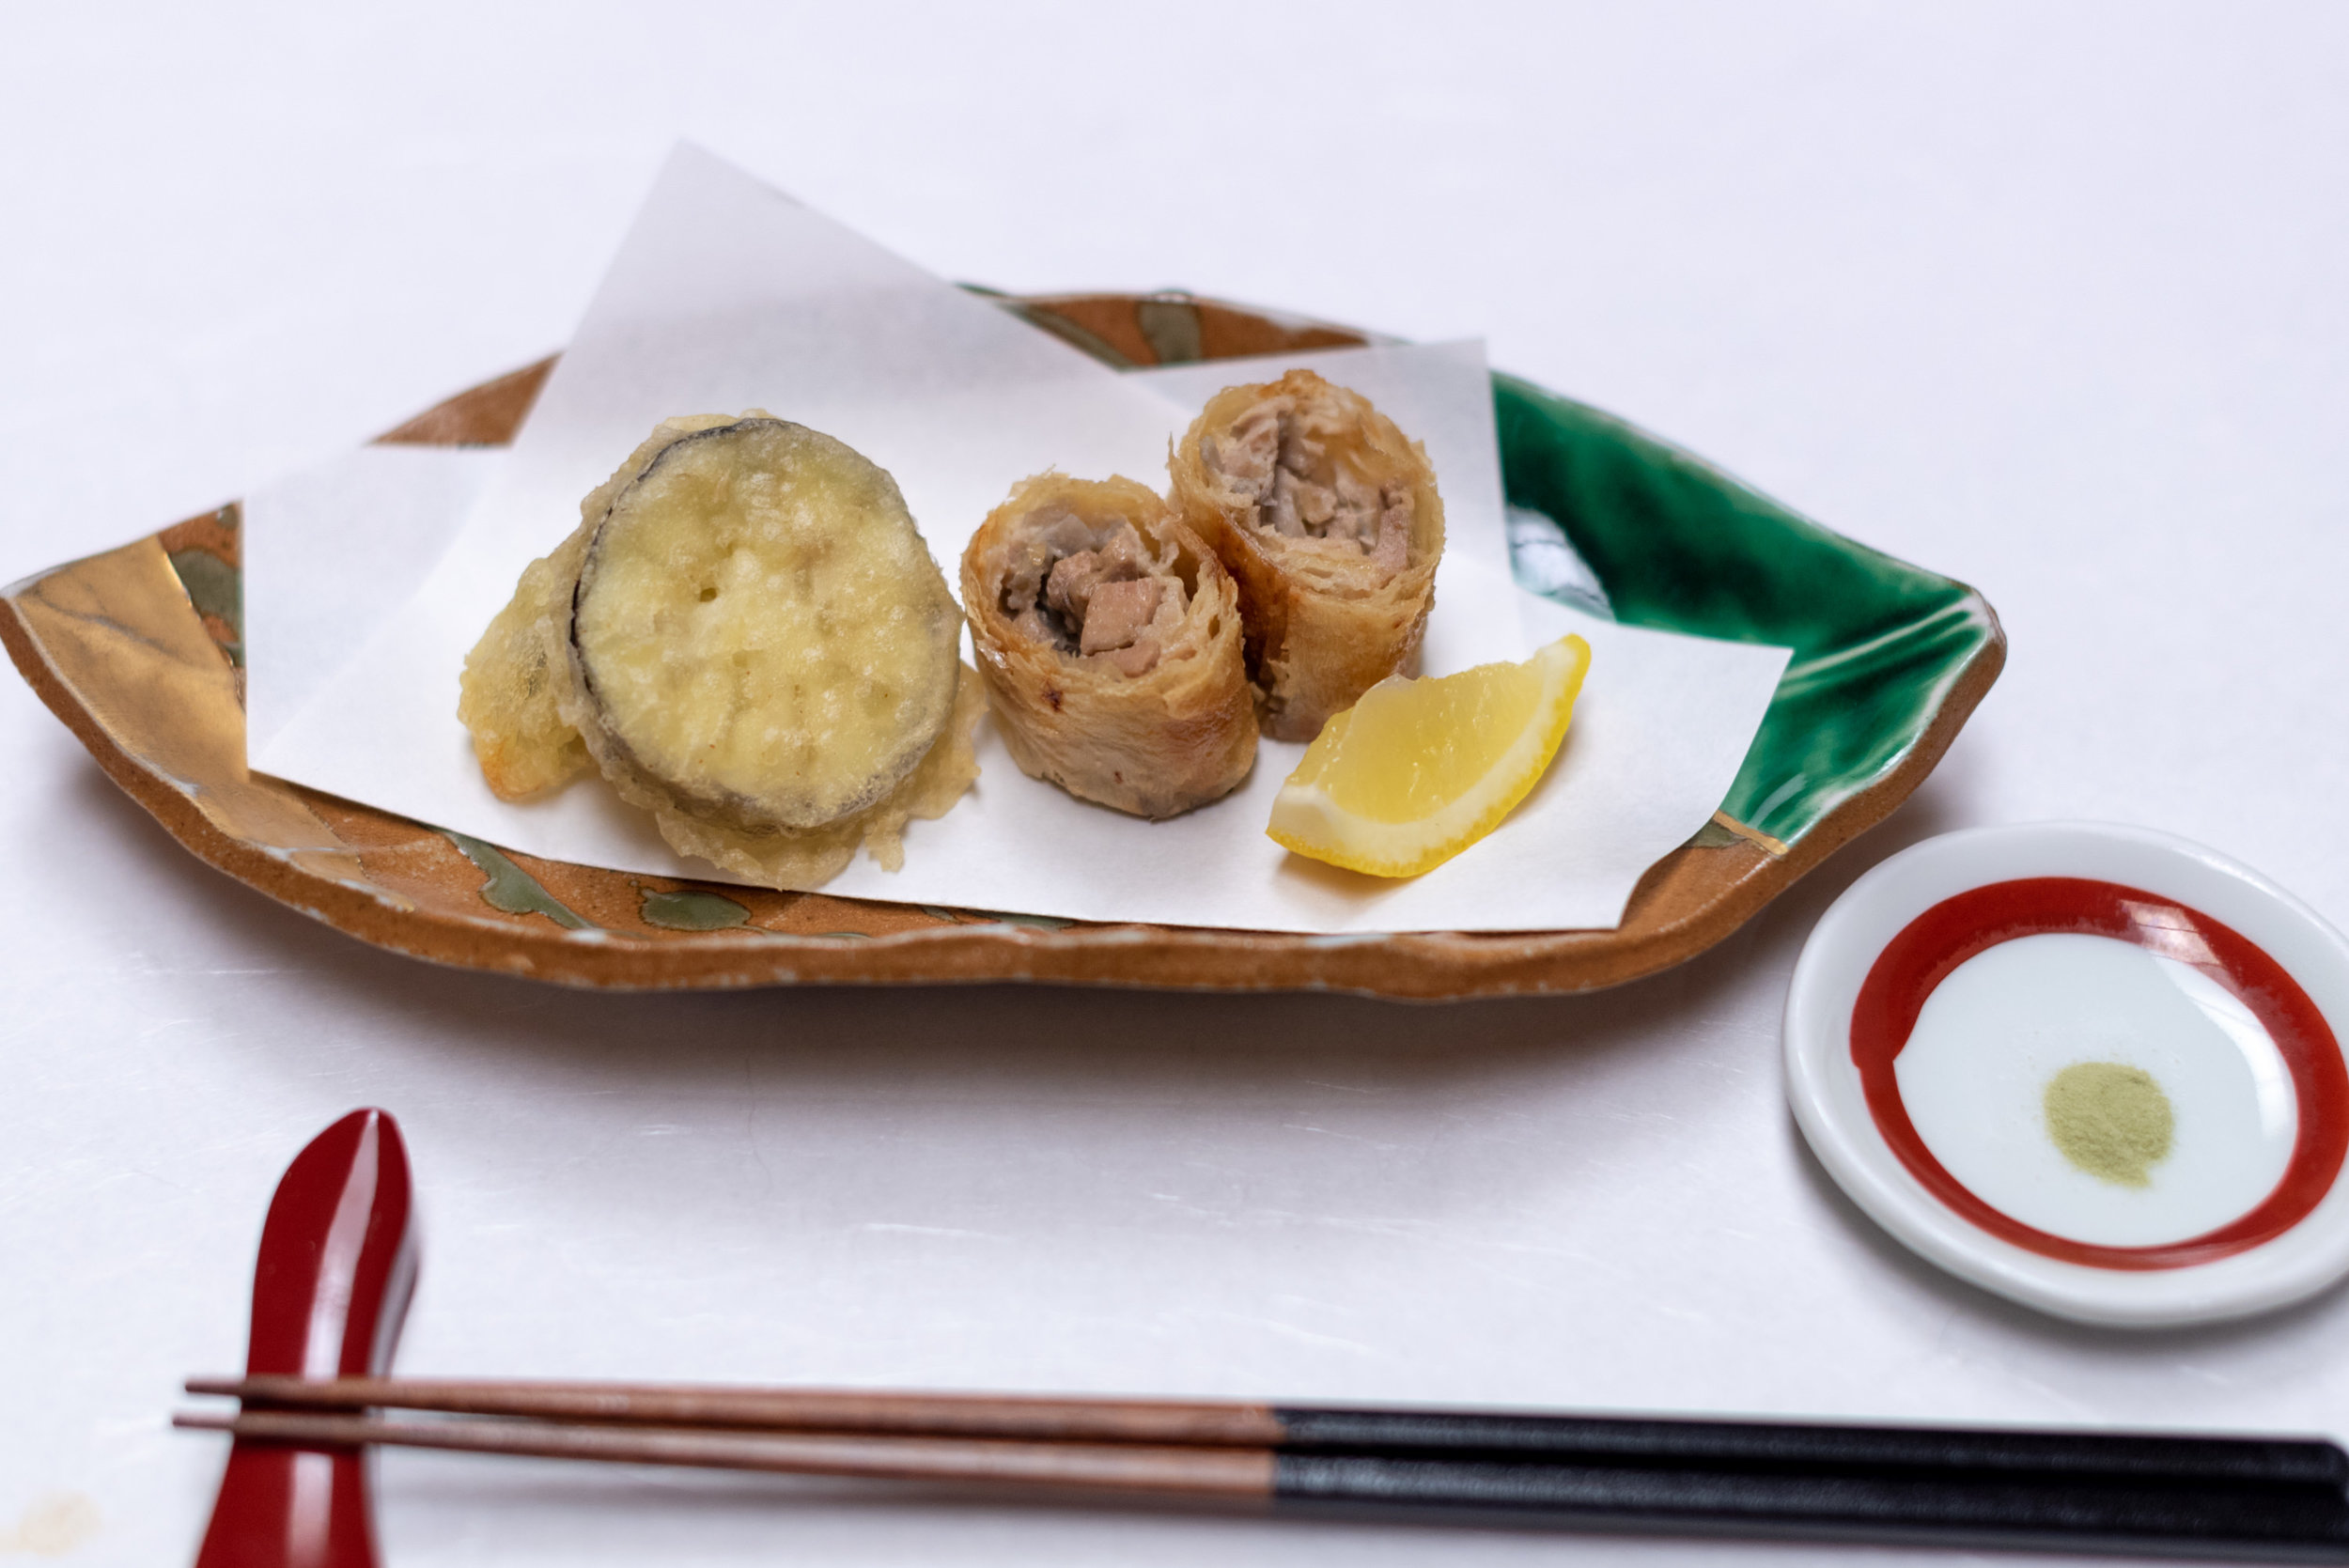 Deep-fried Chicken, Vegetables and Foie Gras wrapped in Yuba  Dinner - Hoshino Resorts KAI Nikko